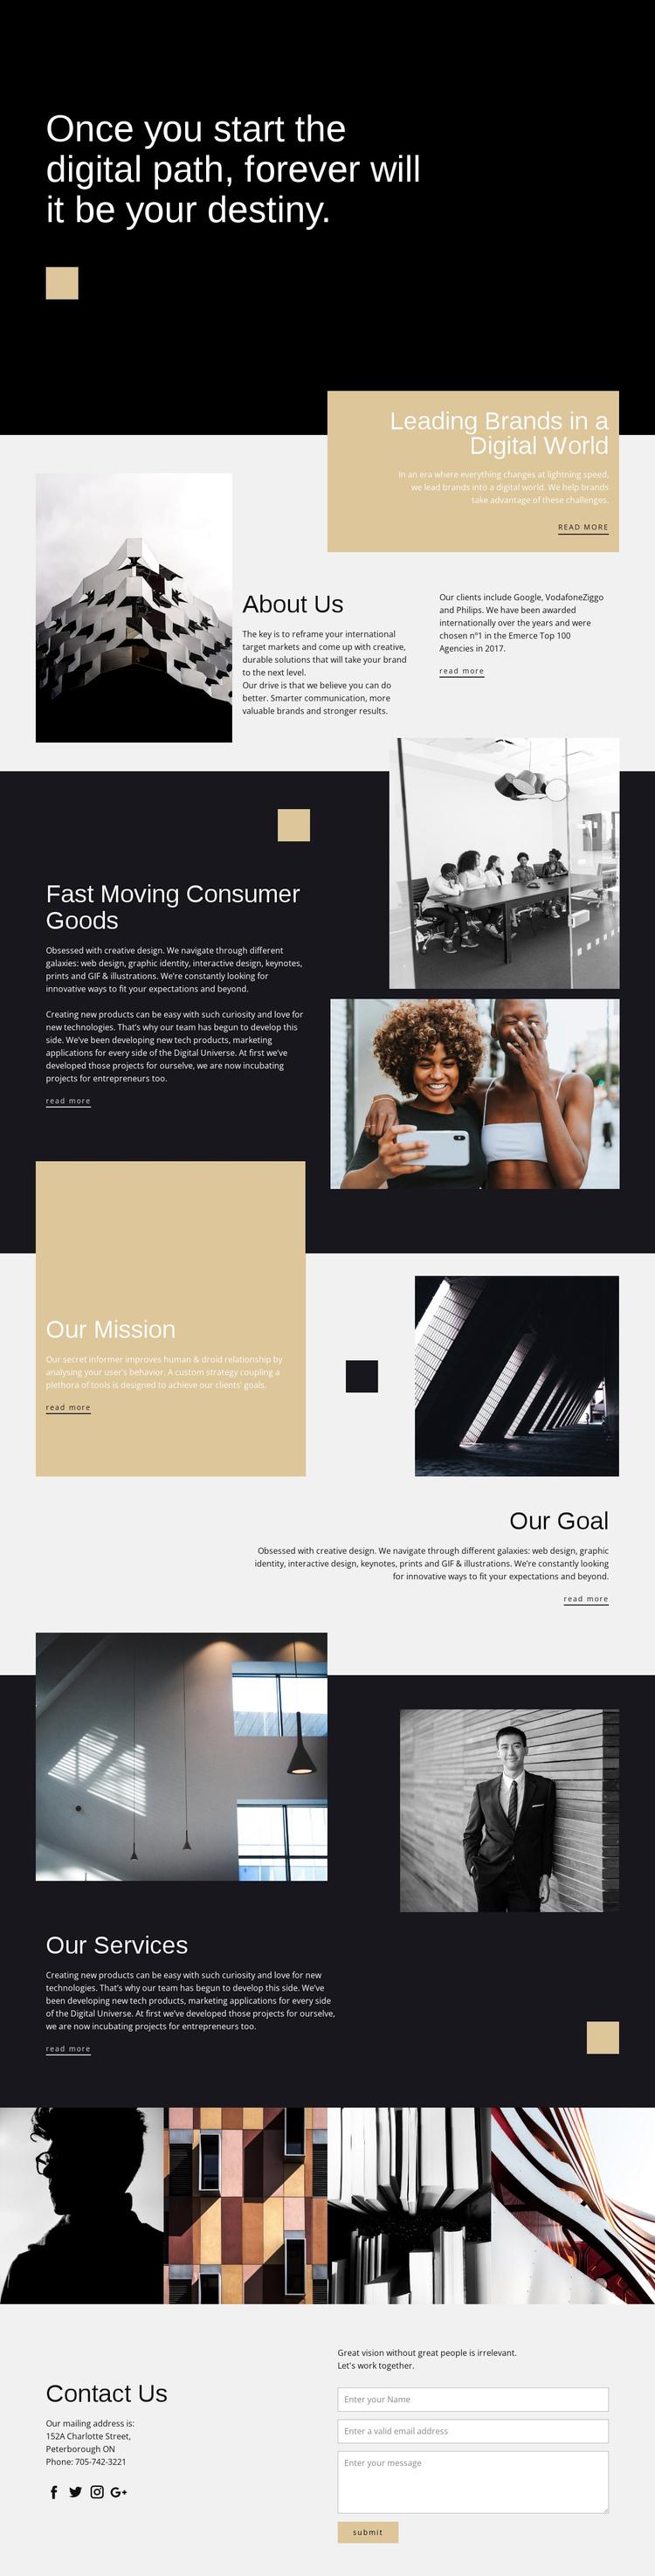 Destiny photo studio Website Builder Software